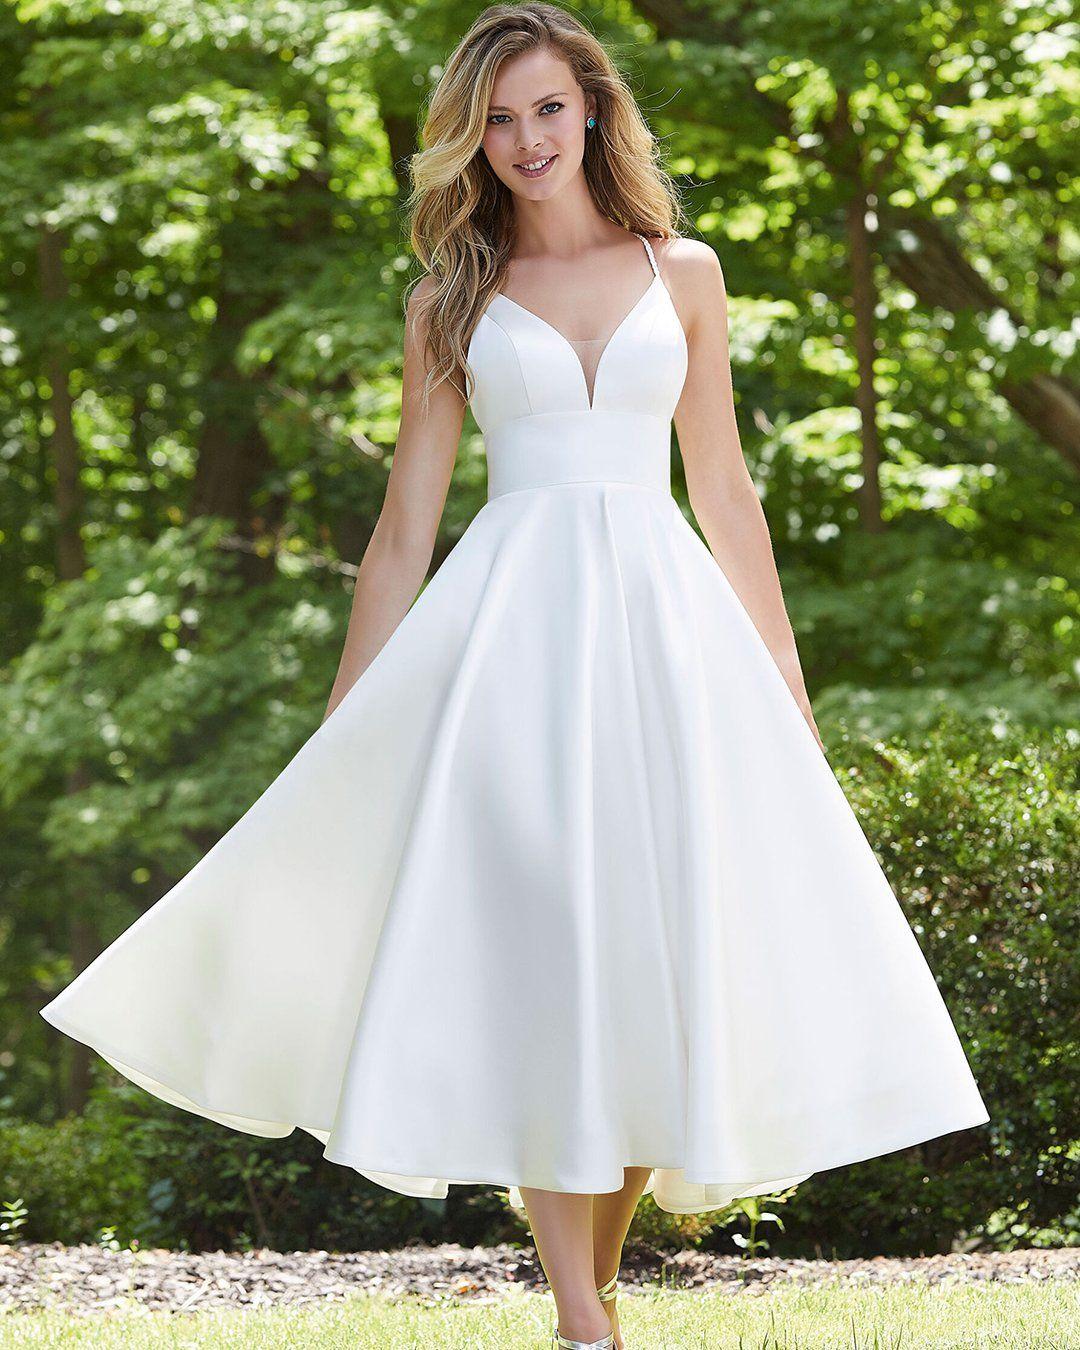 24 Gorgeous Tea Length Wedding Dresses In 2021 Satin Wedding Gown Midi Wedding Dress Tea Length Wedding Dress [ 1350 x 1080 Pixel ]